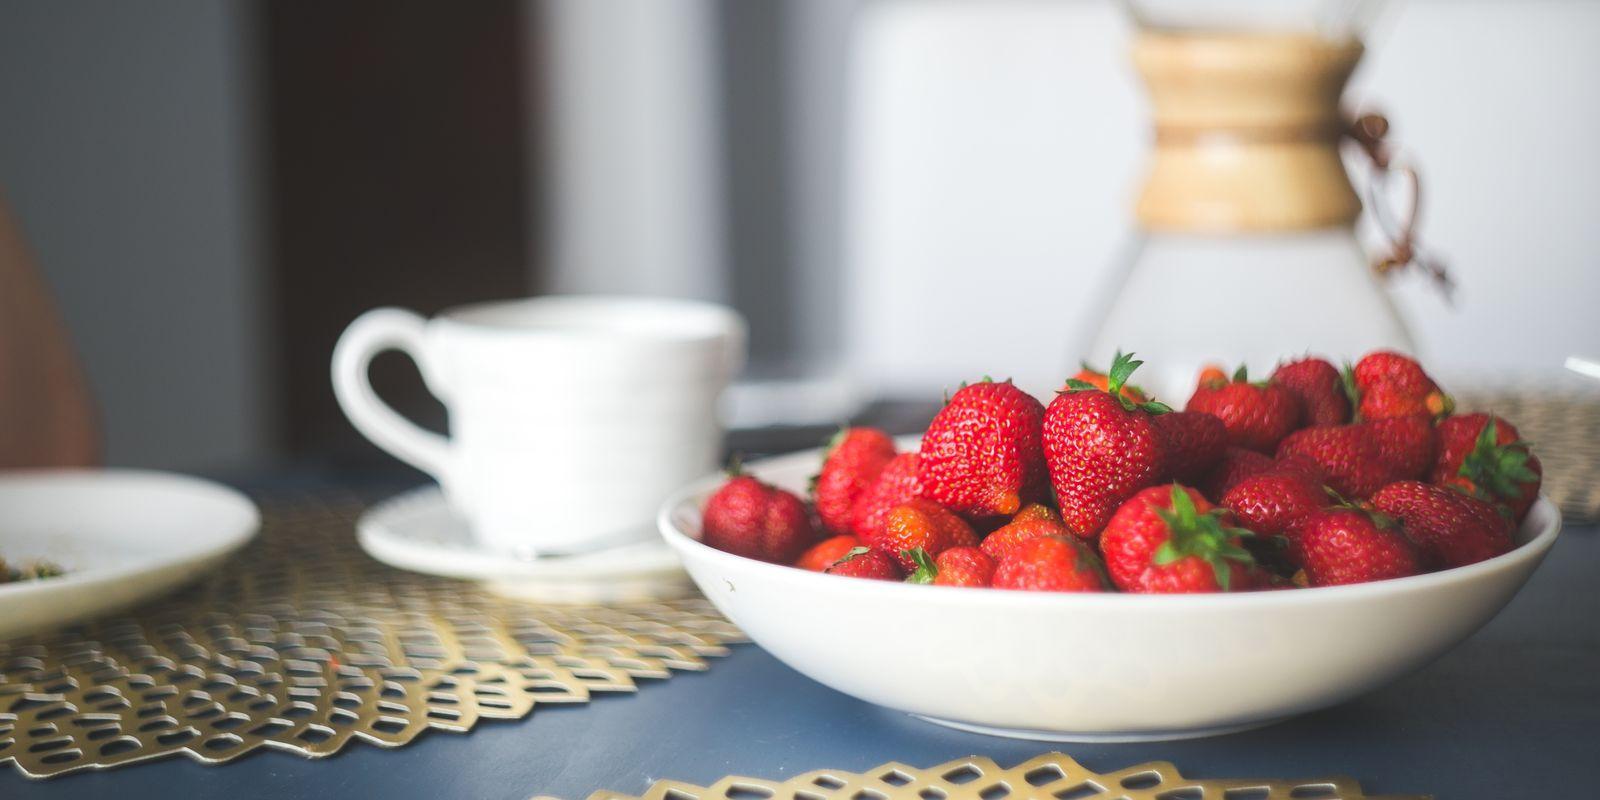 Jahody jako lahodný zdroj vitaminu C